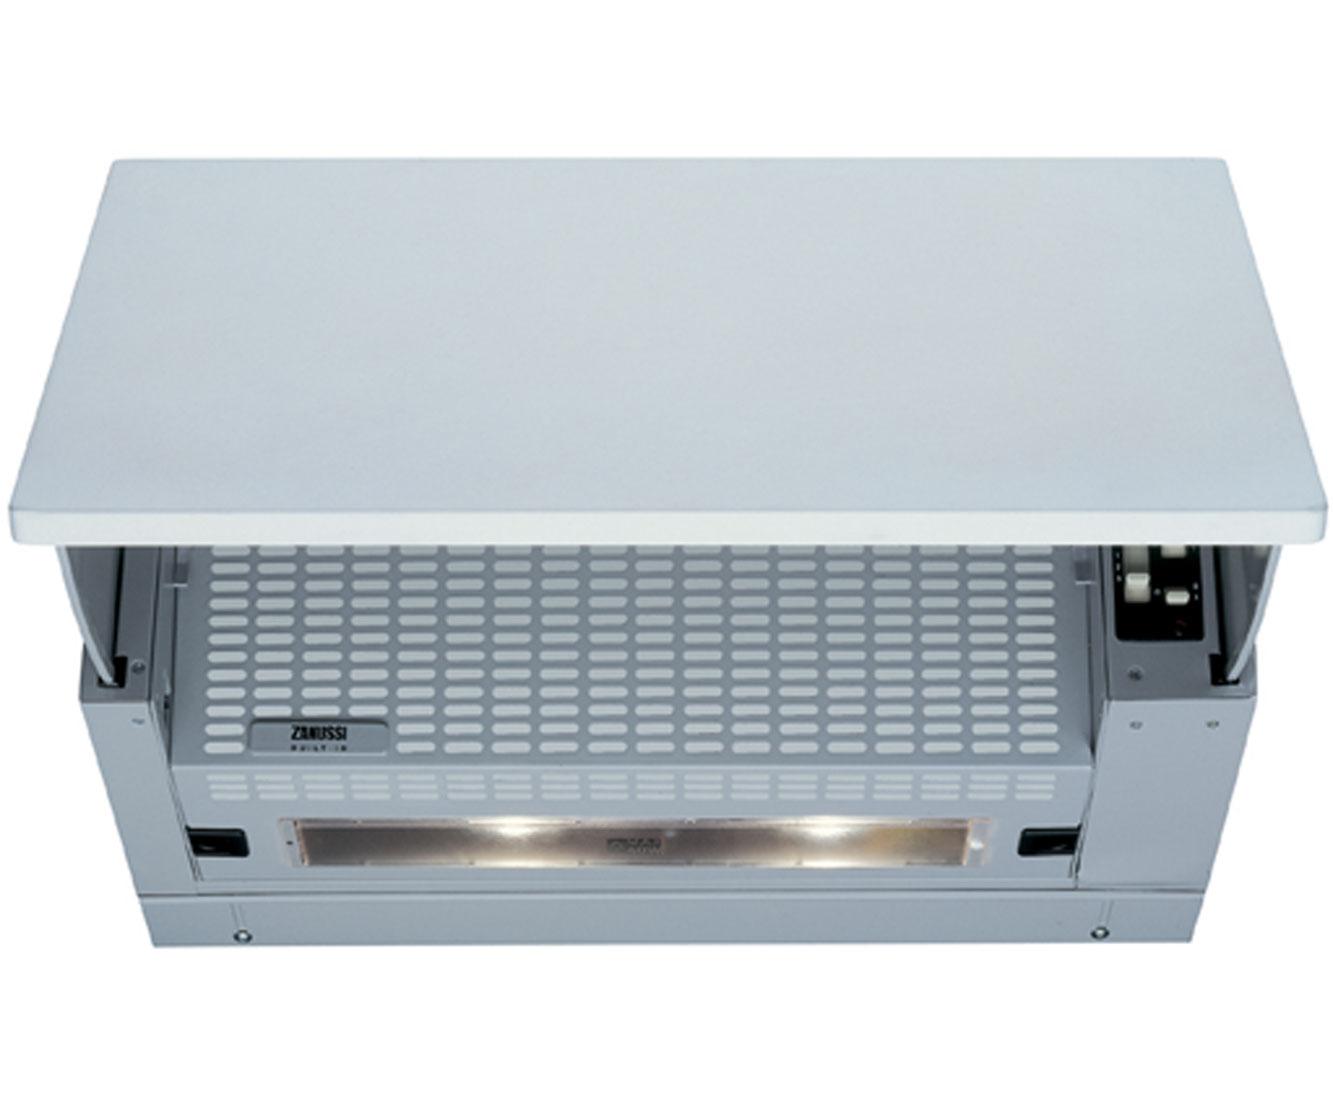 Zanussi ZHI611G 60 cm Integrated Cooker Hood - Grey - E Rated